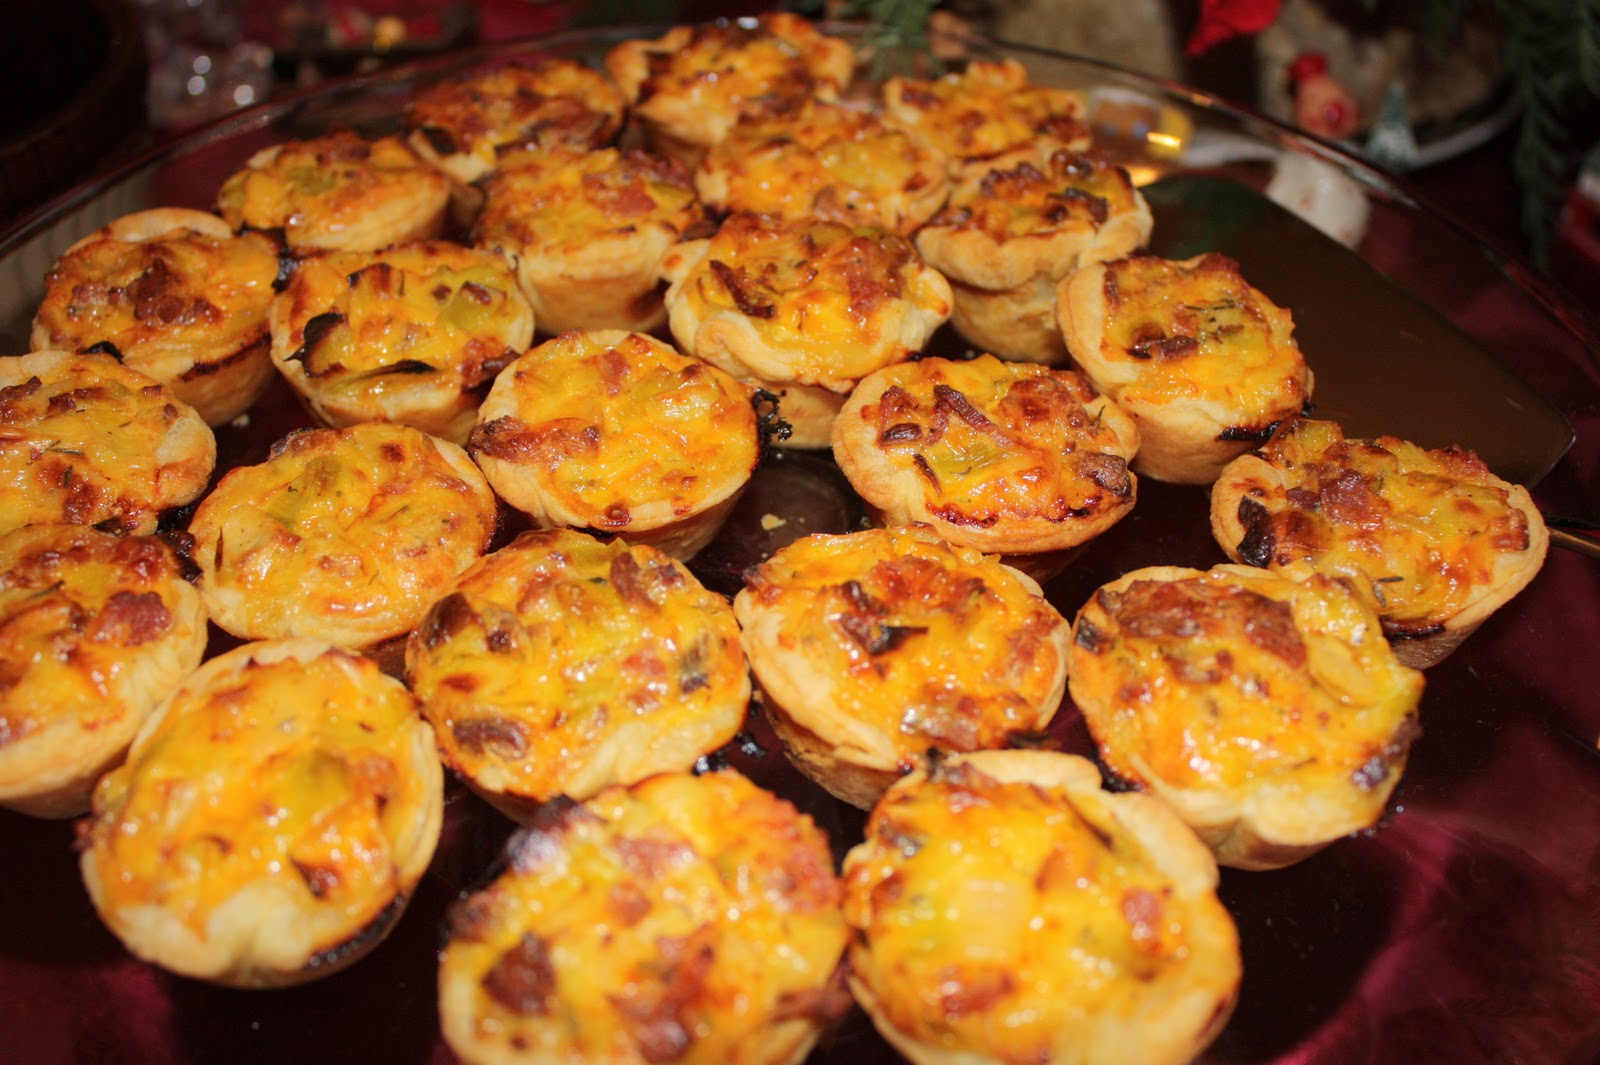 Gourmet Getaway: Bacon, Leek and Cheddar Mini Quiches